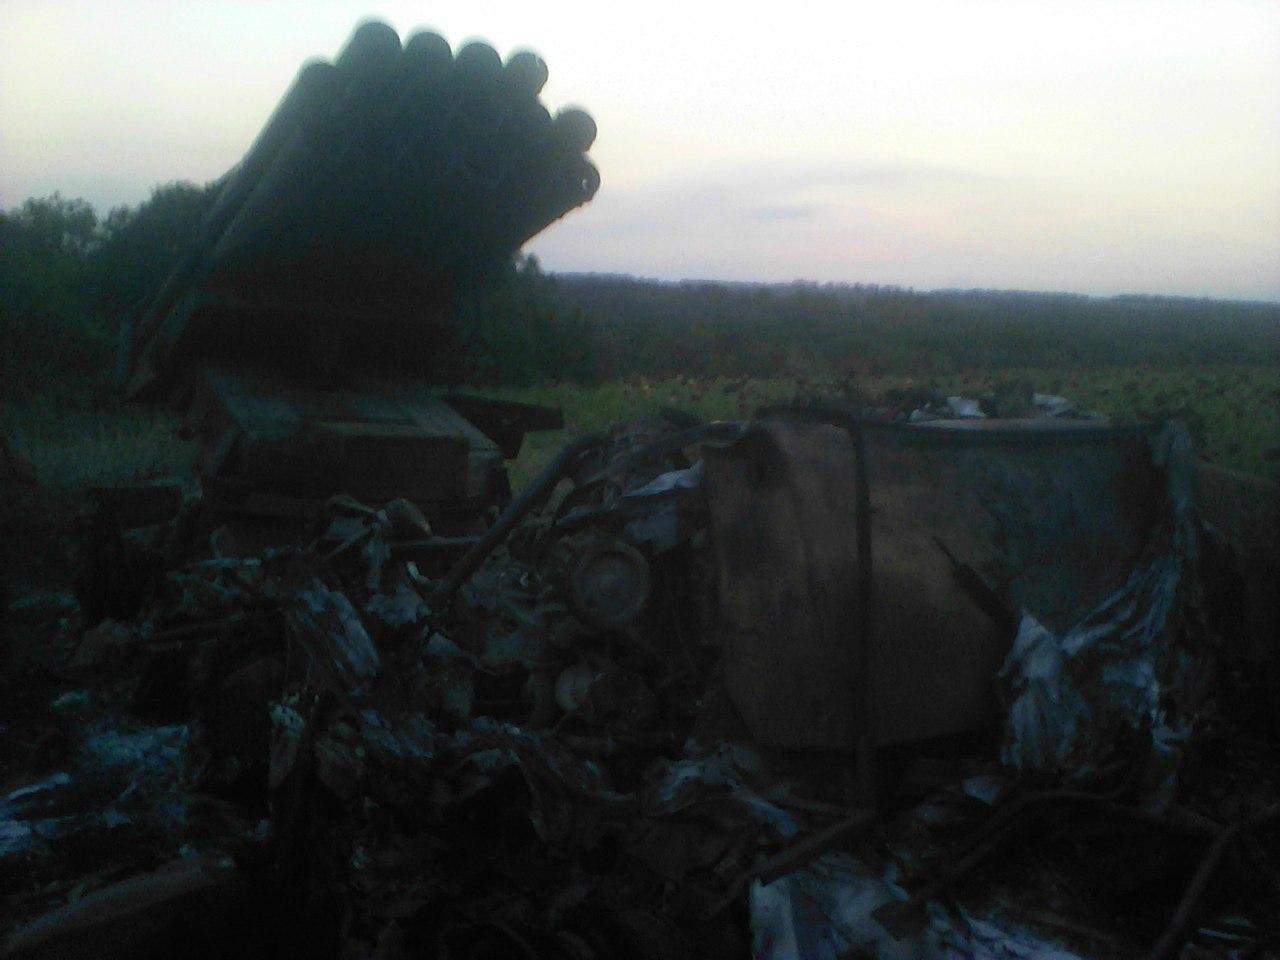 Donbass Liberation War Multimedia RgOqRo3M0V4